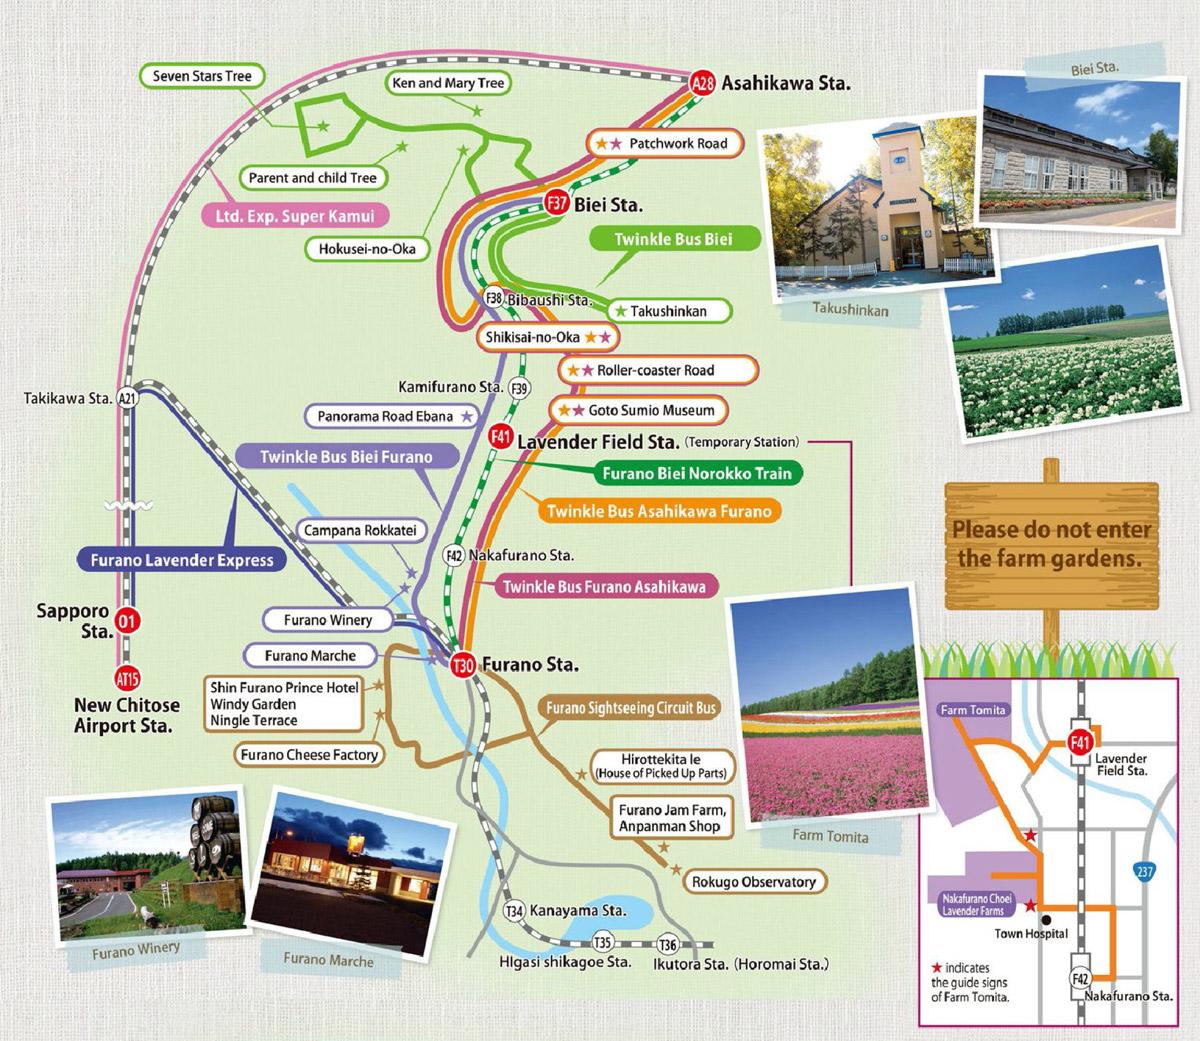 kuzey japonya gezi rehberi - tomita çiftliği -hokkaido